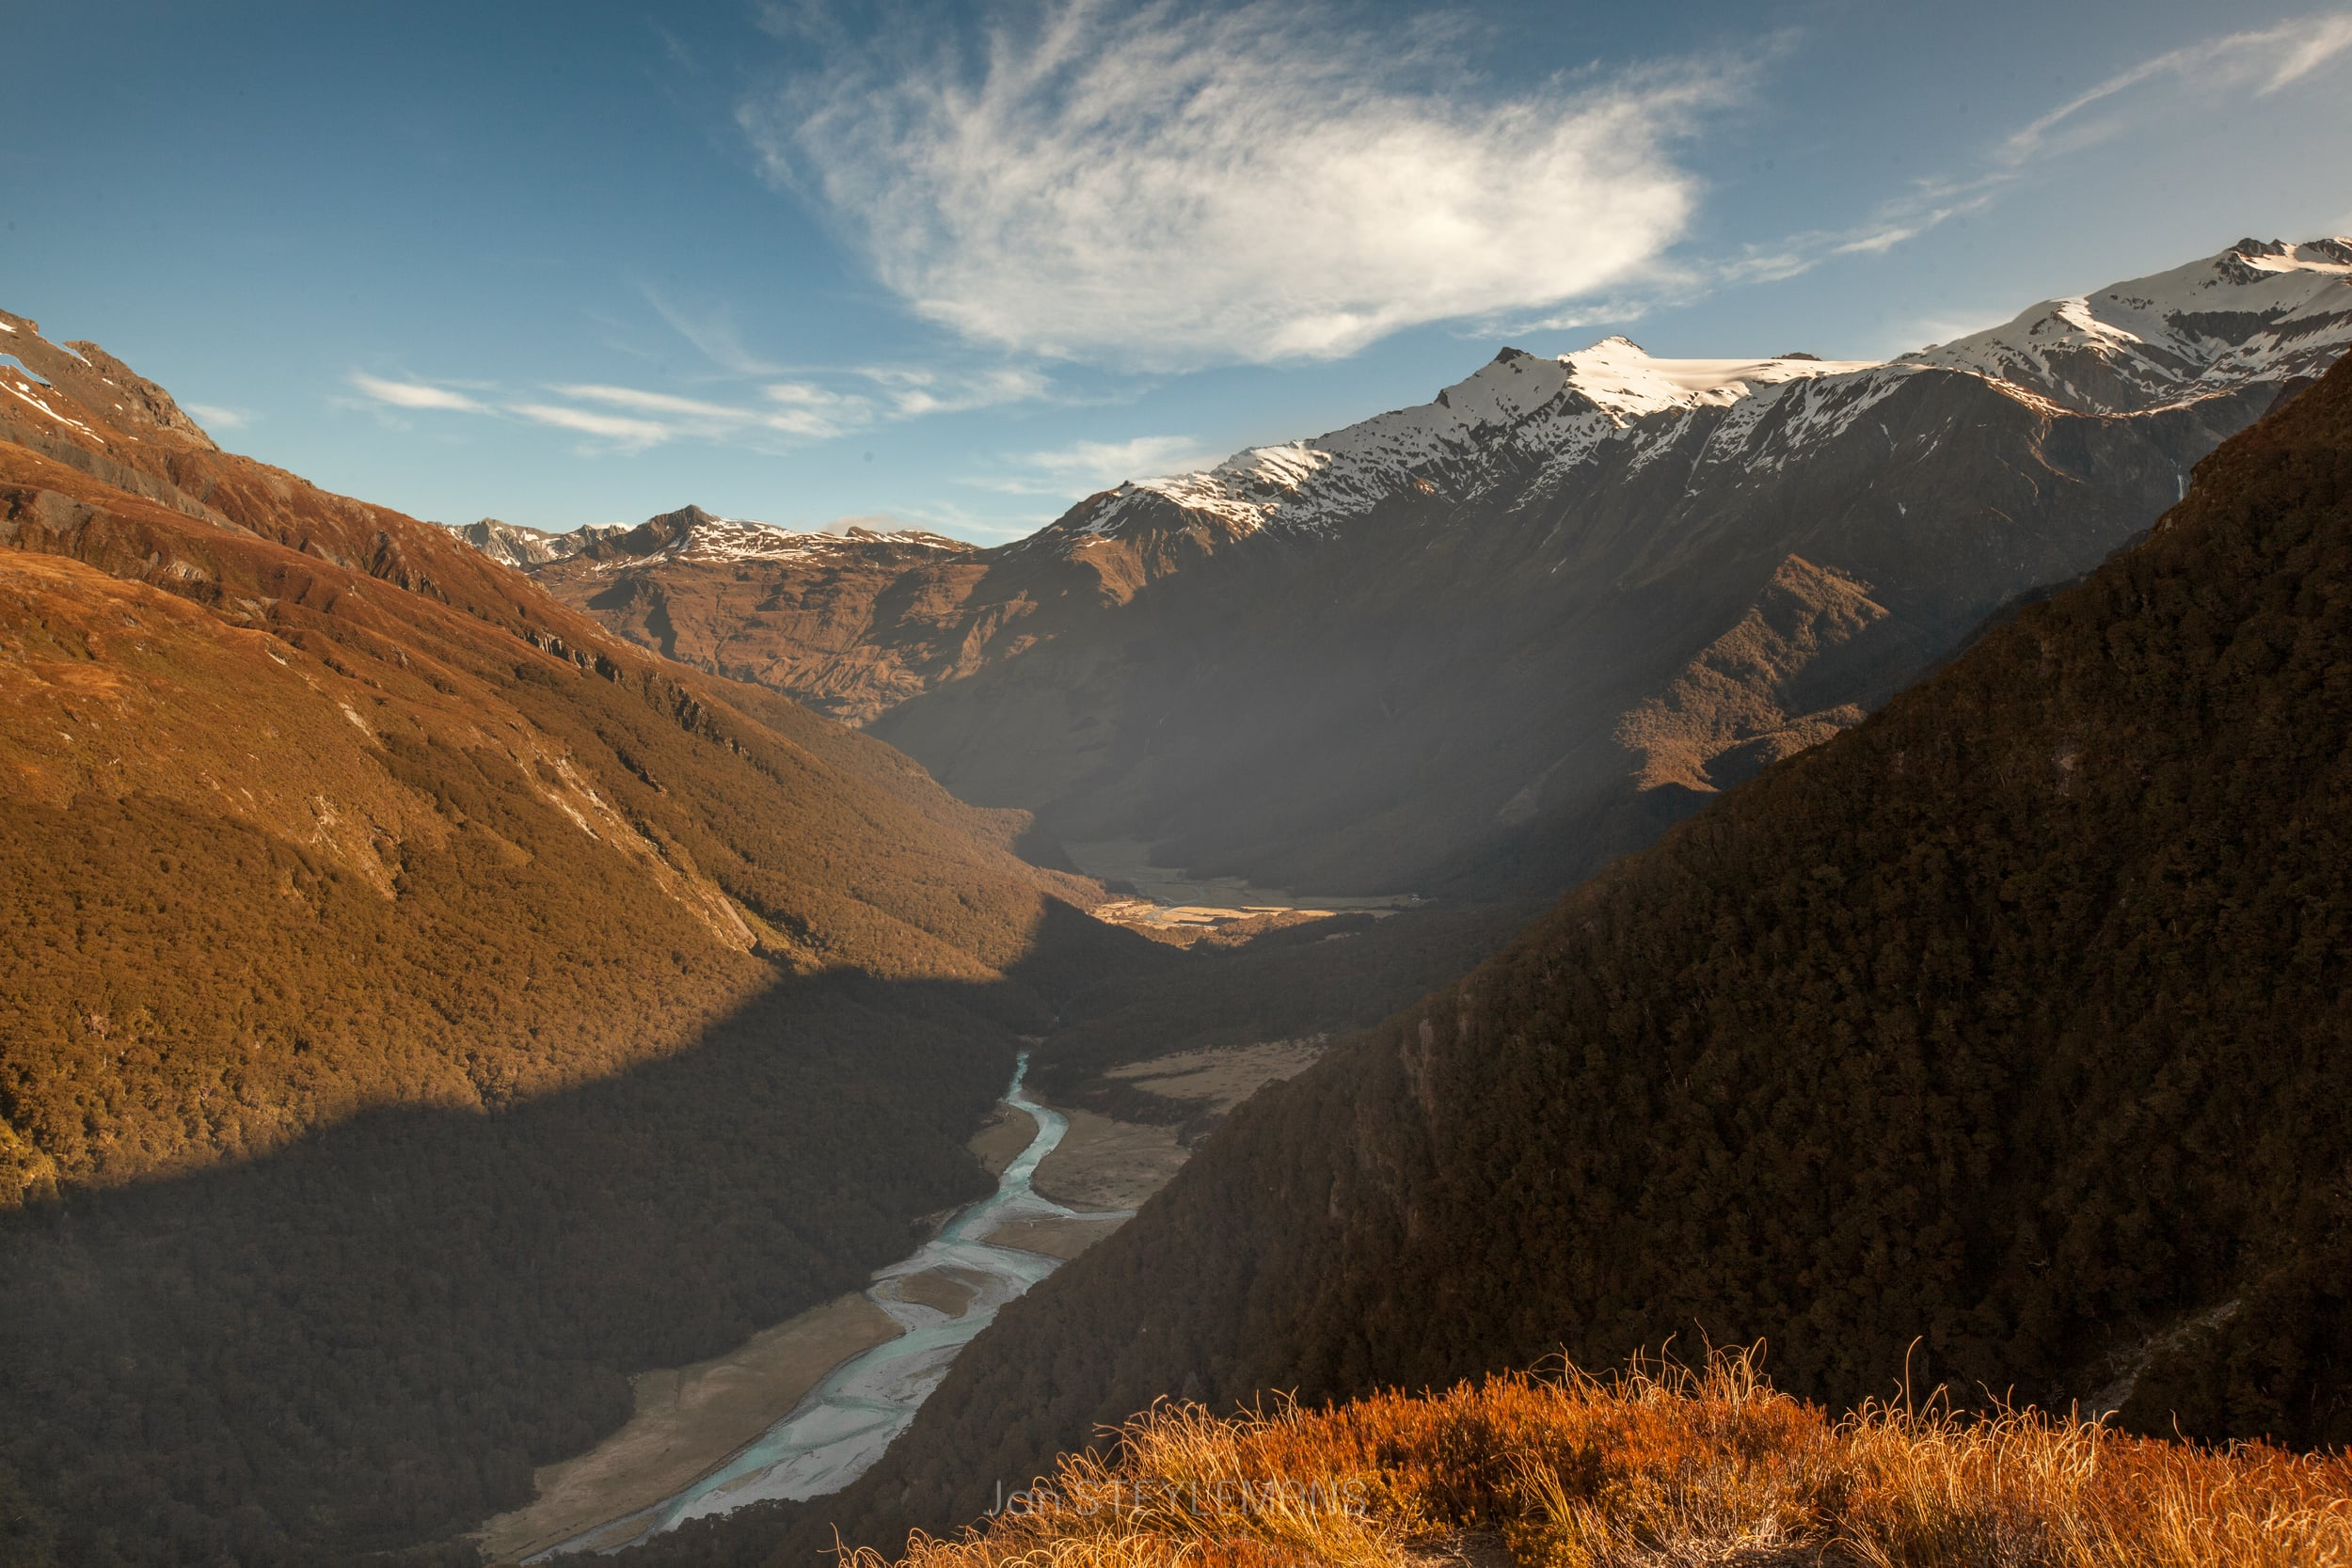 Sight from Liverpool hut, Mount Aspiring National Park, New Zealand